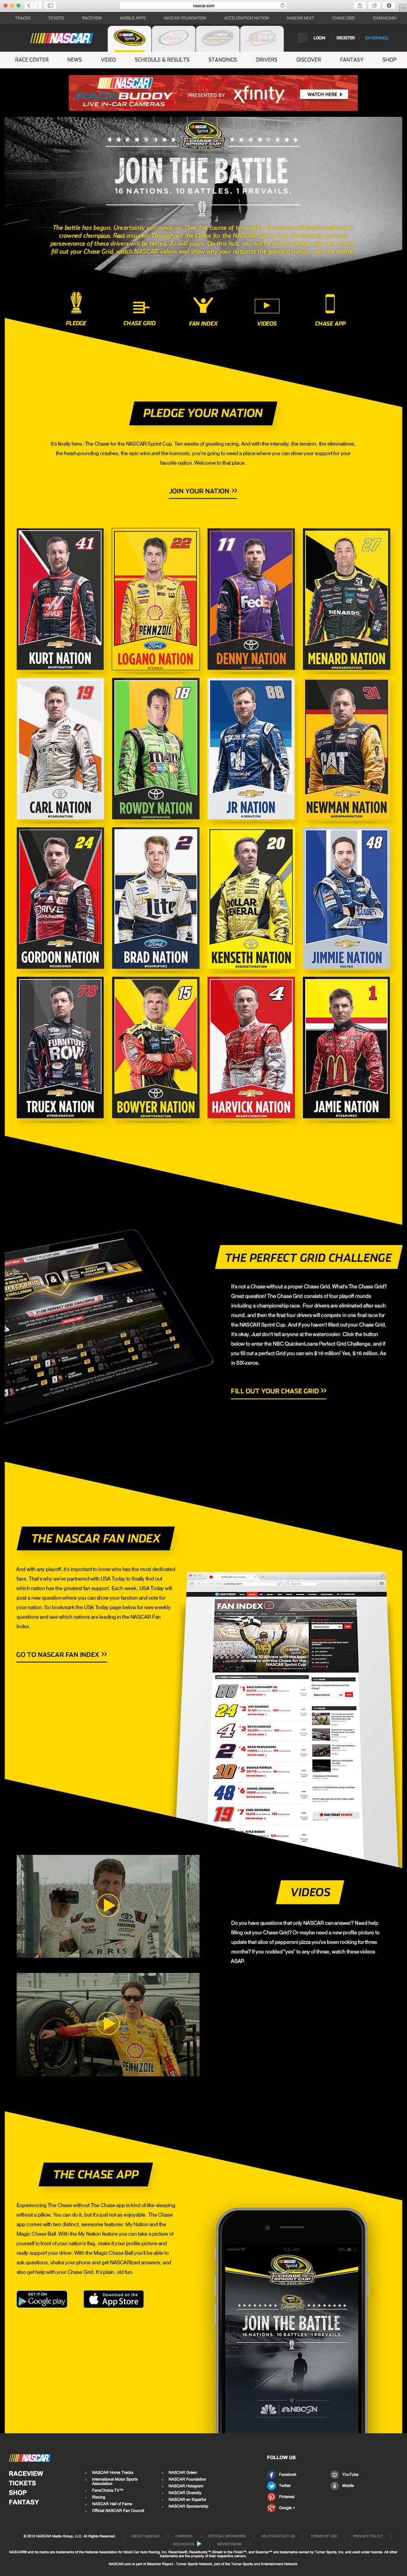 NASCAR_2015_Chase_Hub.jpg